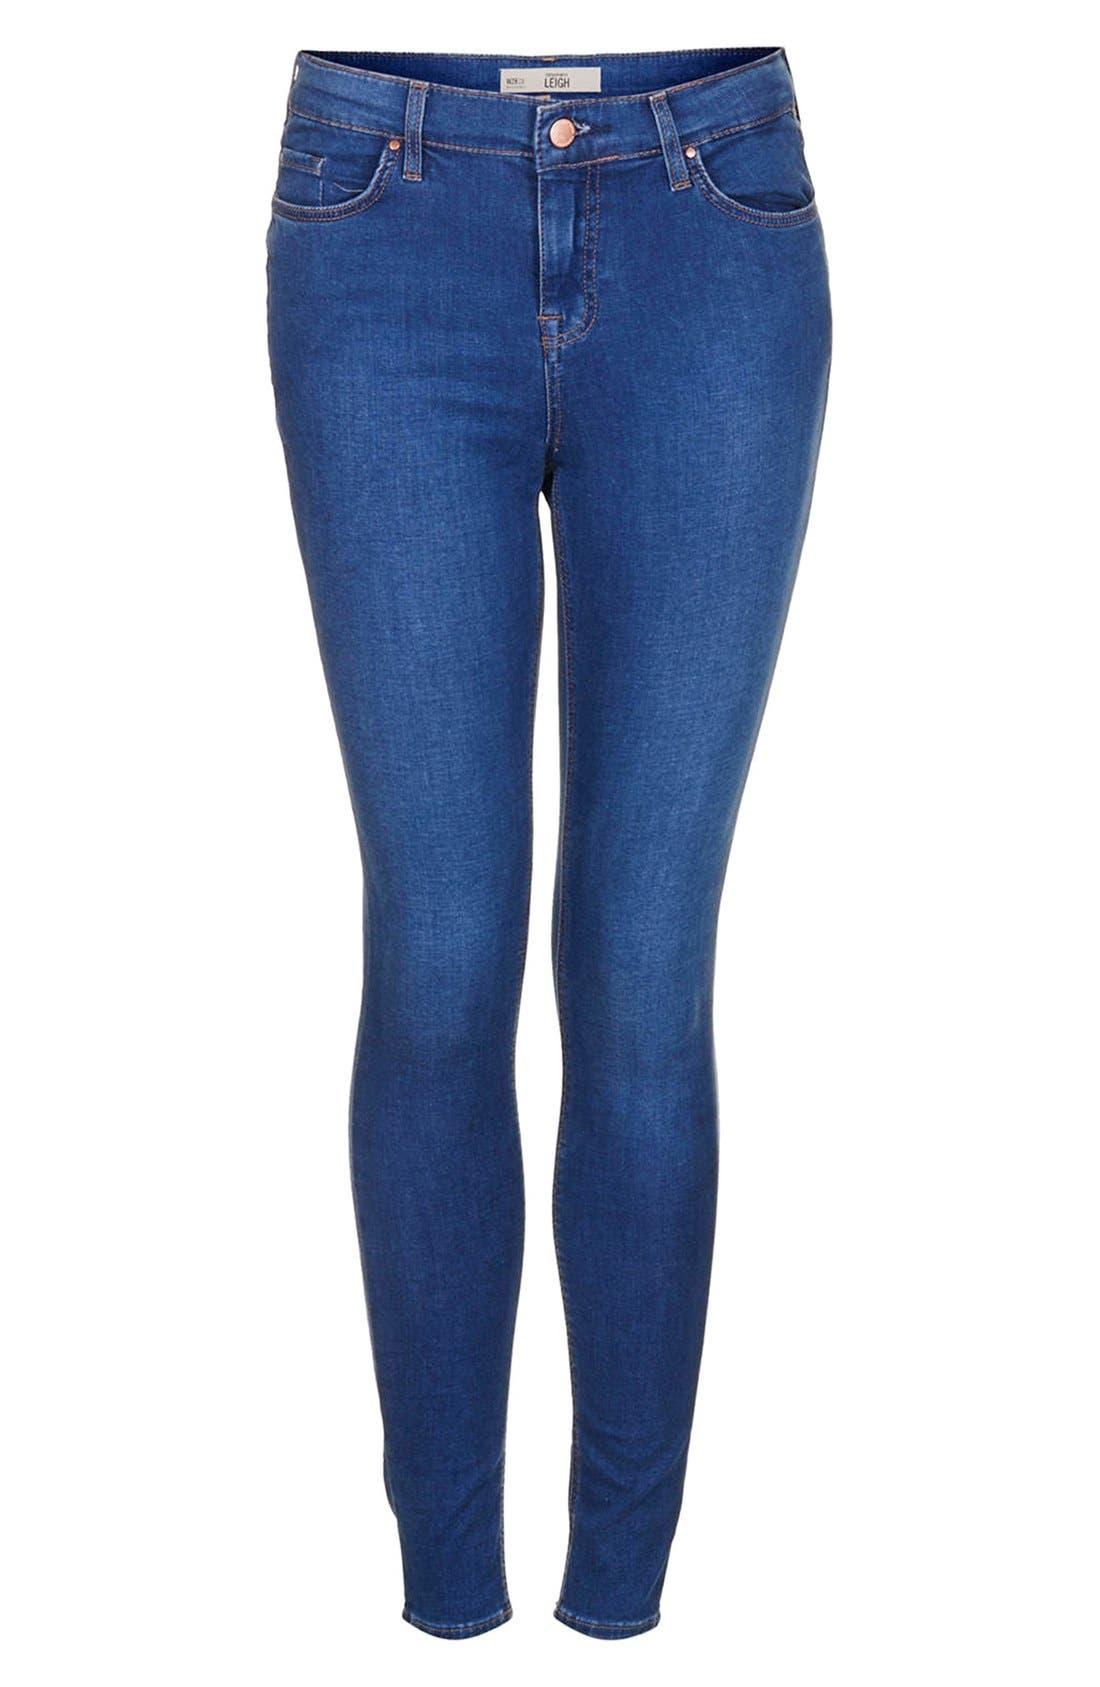 Alternate Image 3  - Topshop 'Leigh' Ankle Skinny Jeans (Mid Denim)